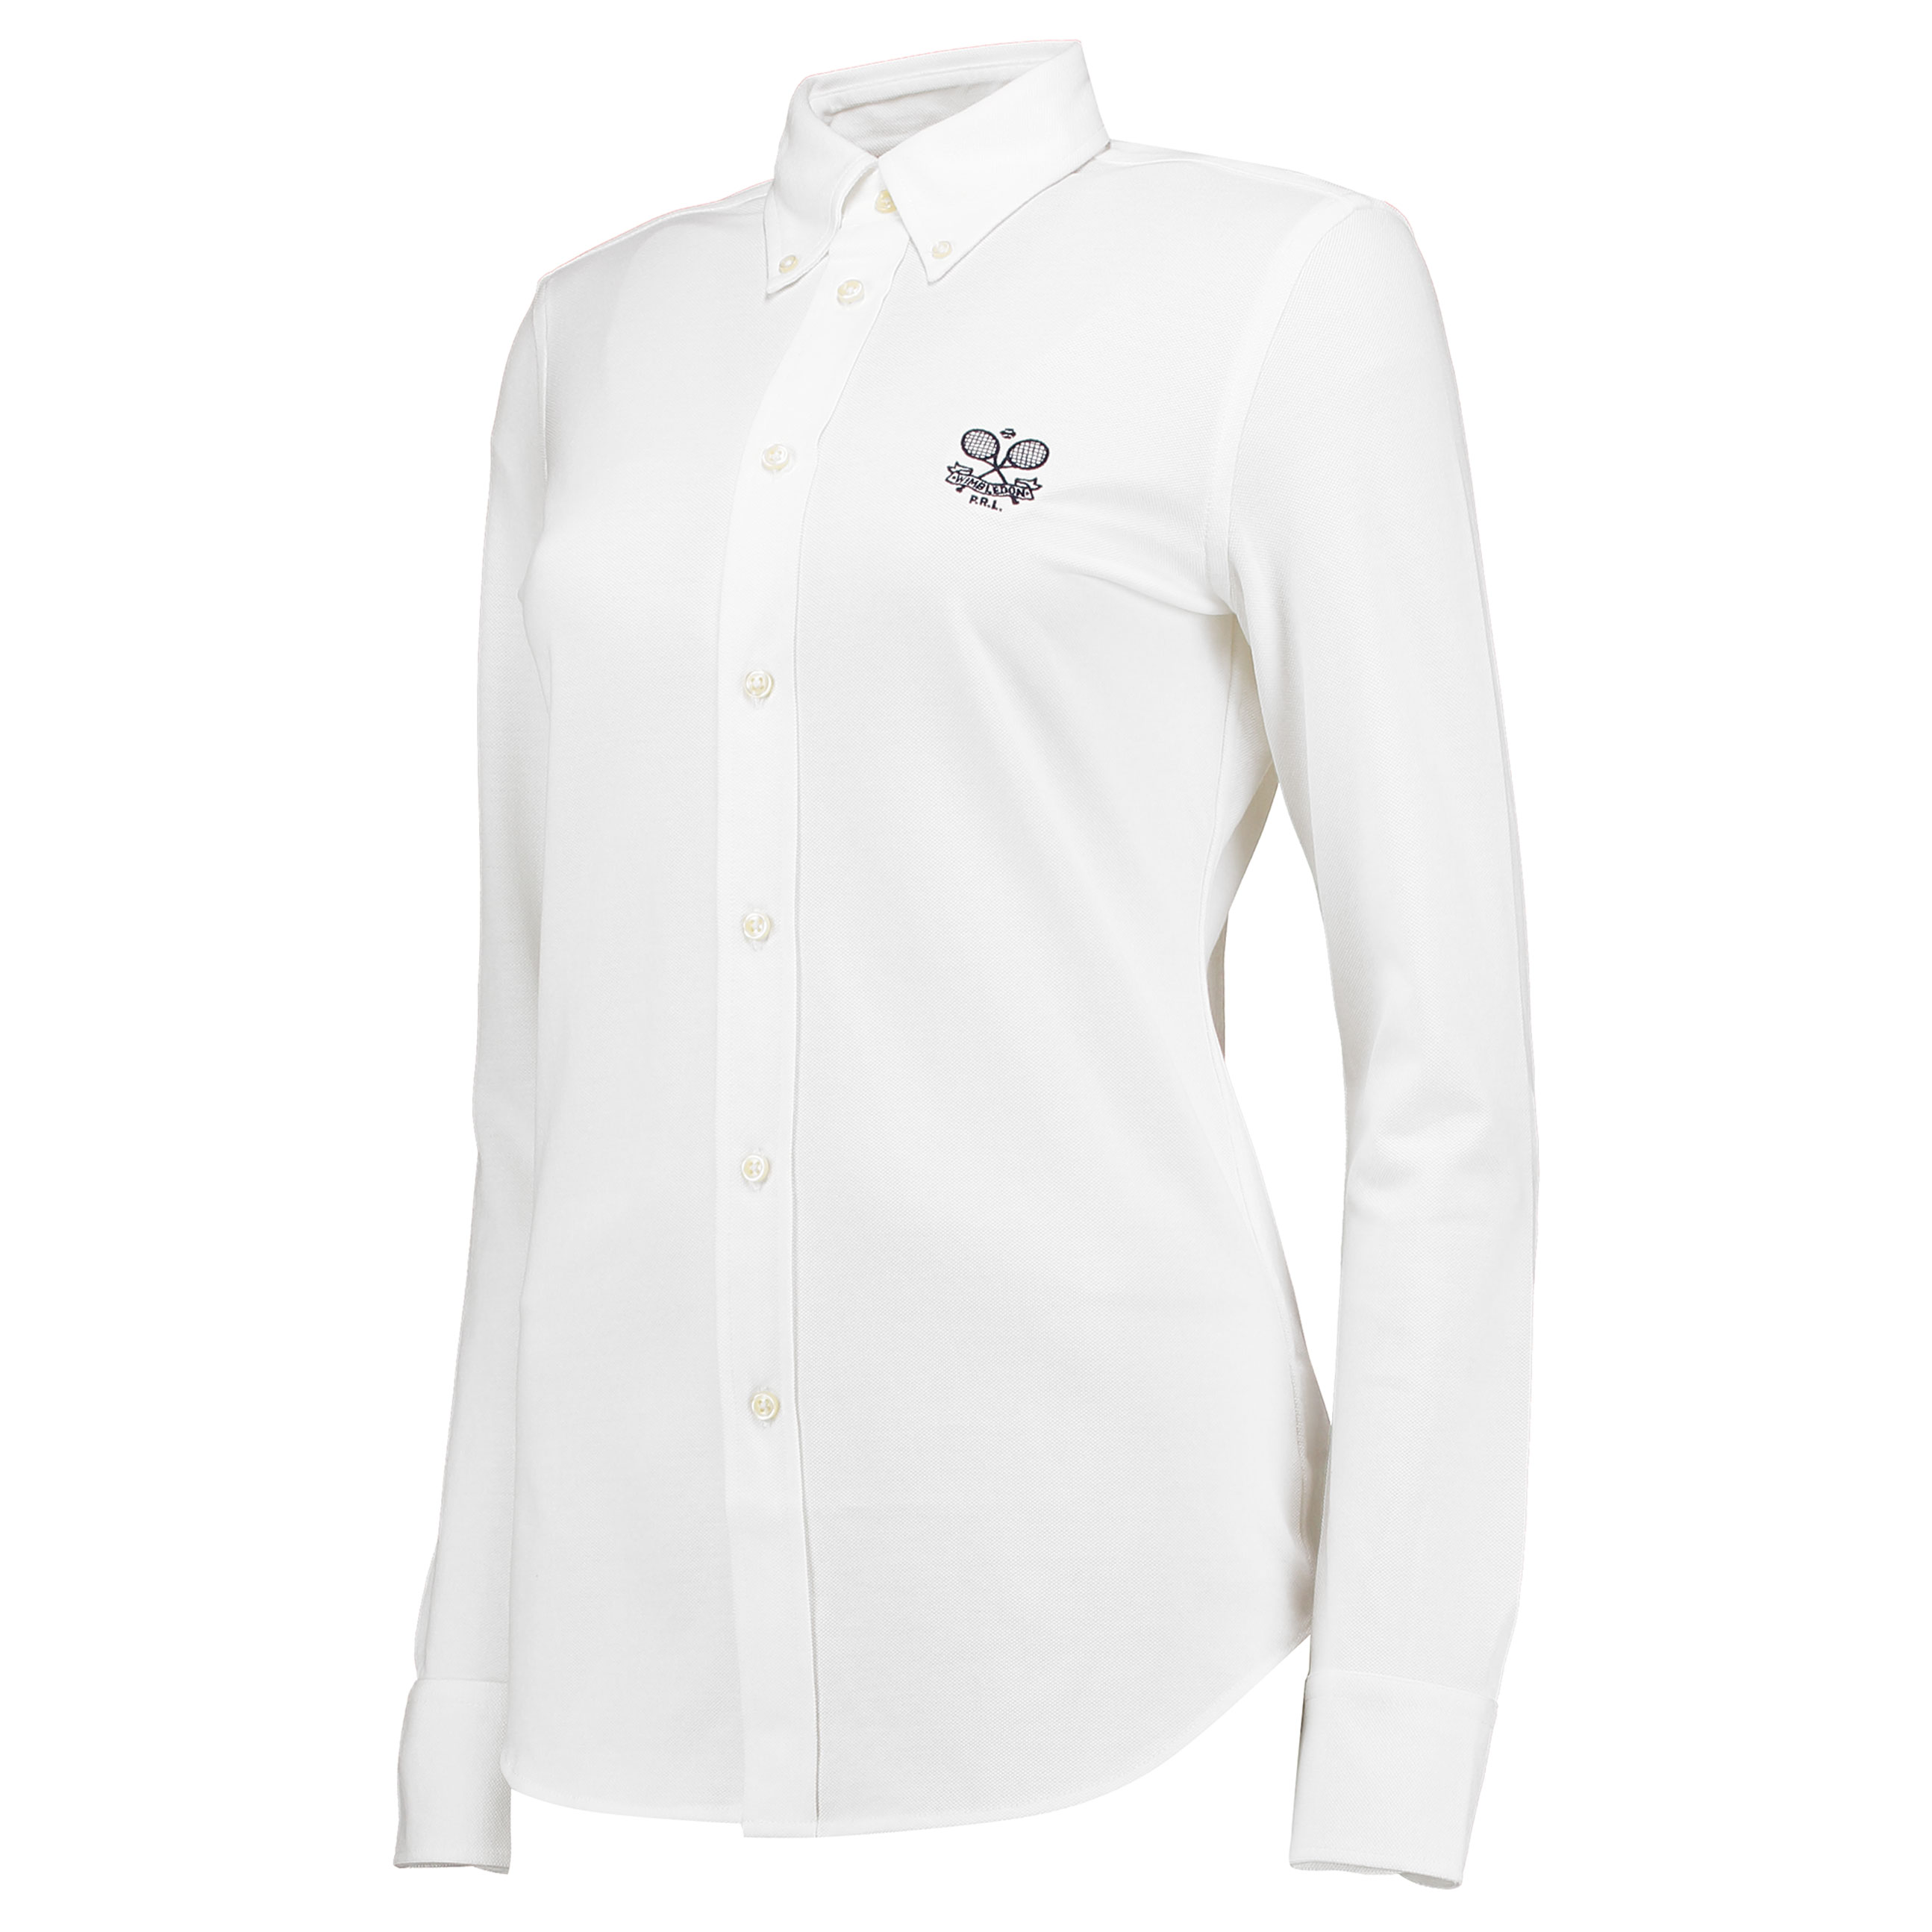 Wimbledon Ralph Lauren Oxford Shirt - White - Ladies